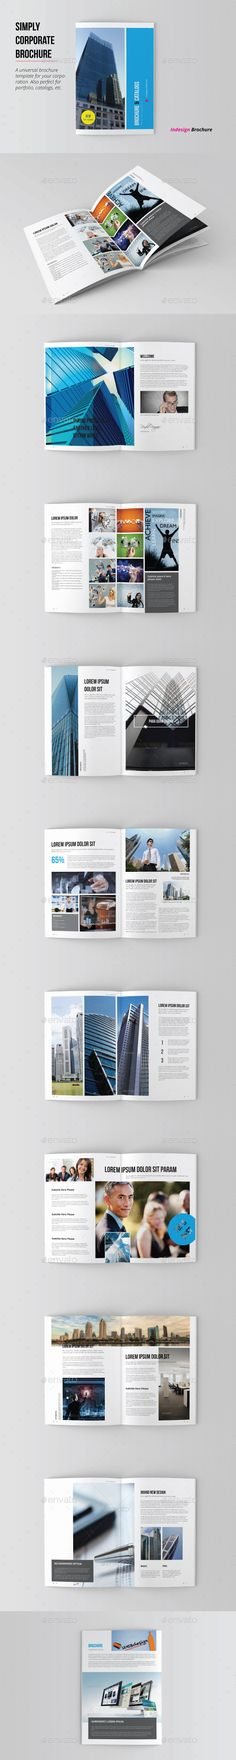 Corporate Minimal Brochure Template #design Download: http://graphicriver.net/item/corporate-minimal-brochure/12646356?ref=ksioks